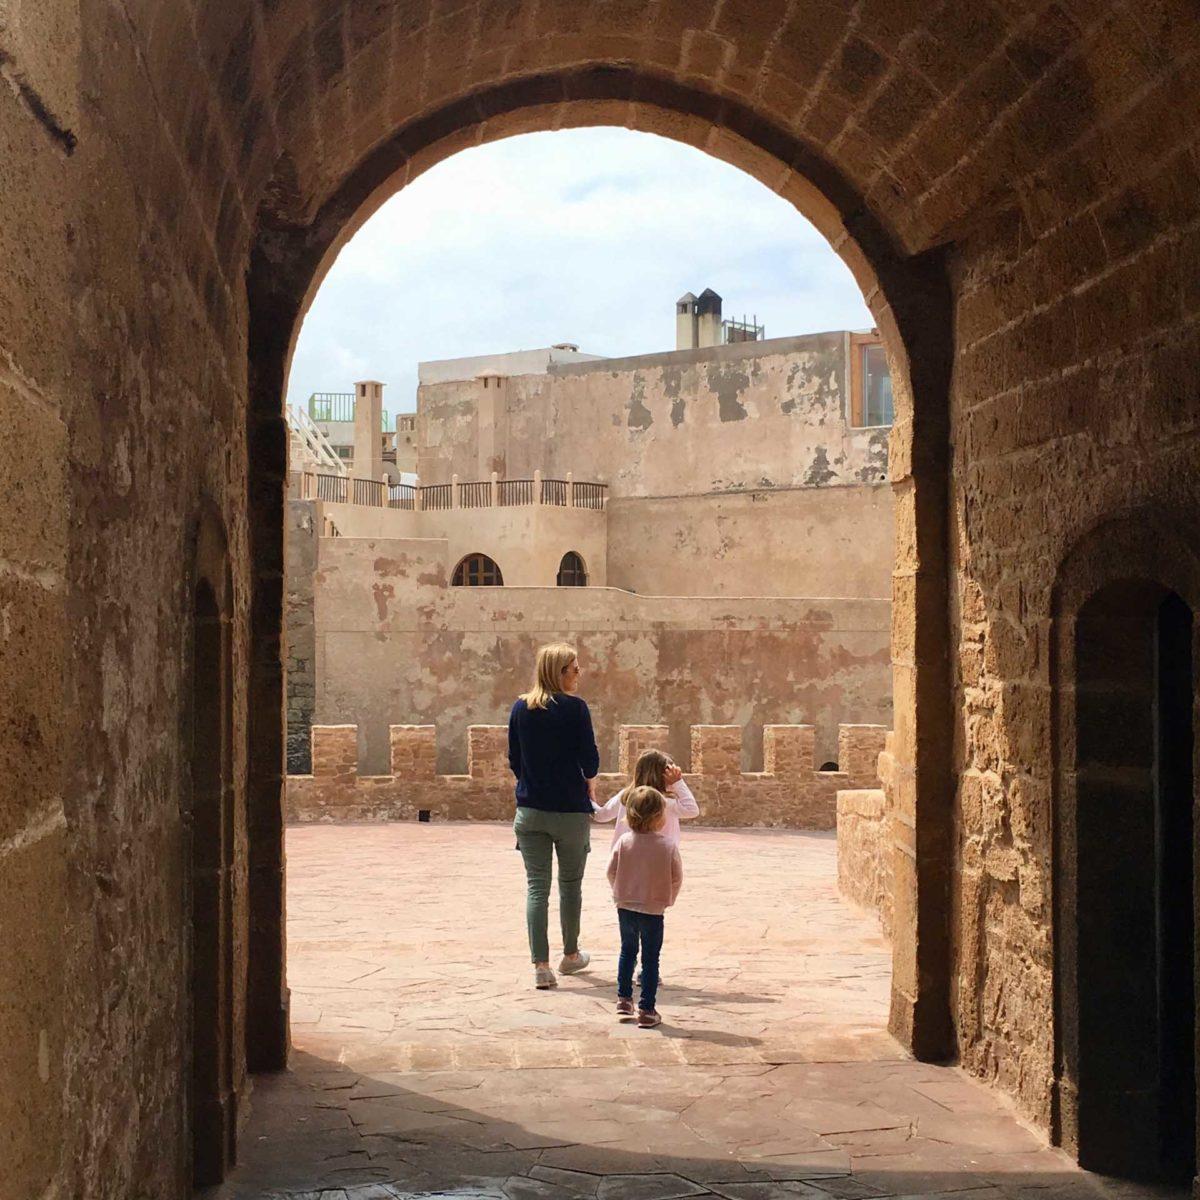 Familienferien in Marokko, Teil 1 – Das Meer